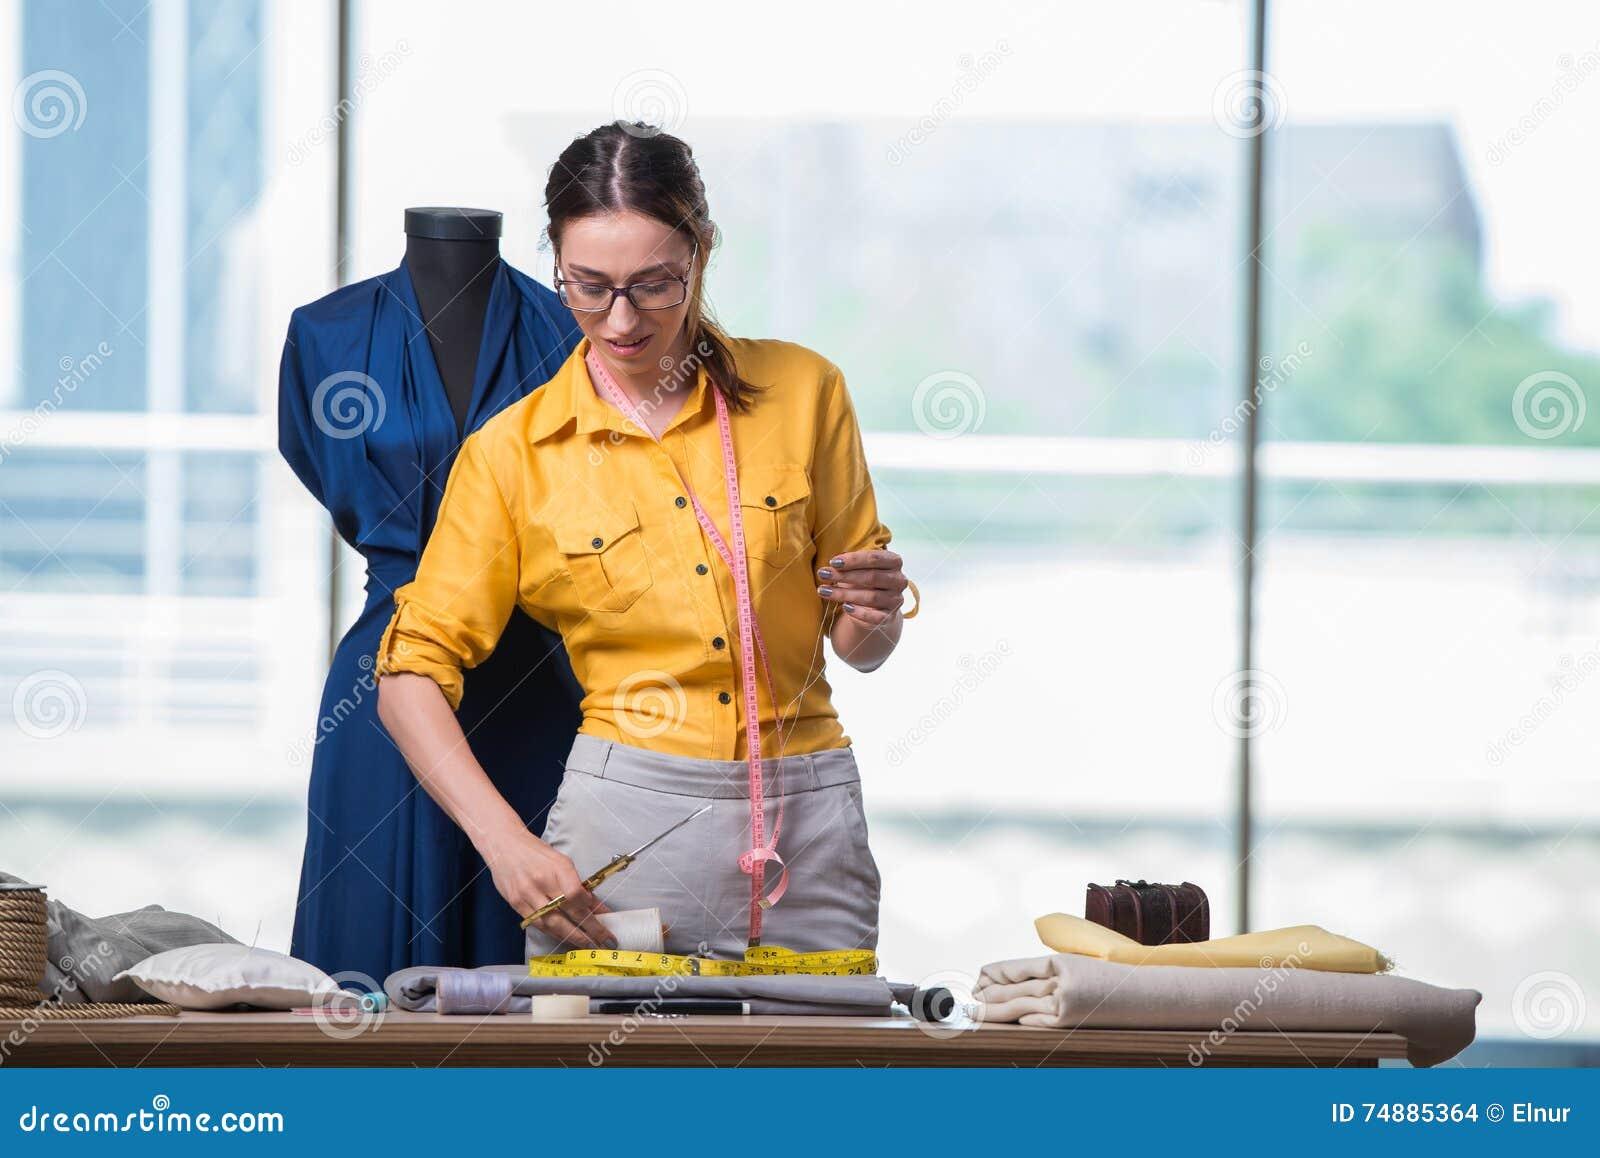 De vrouwenkleermaker die aan nieuwe kleding werken